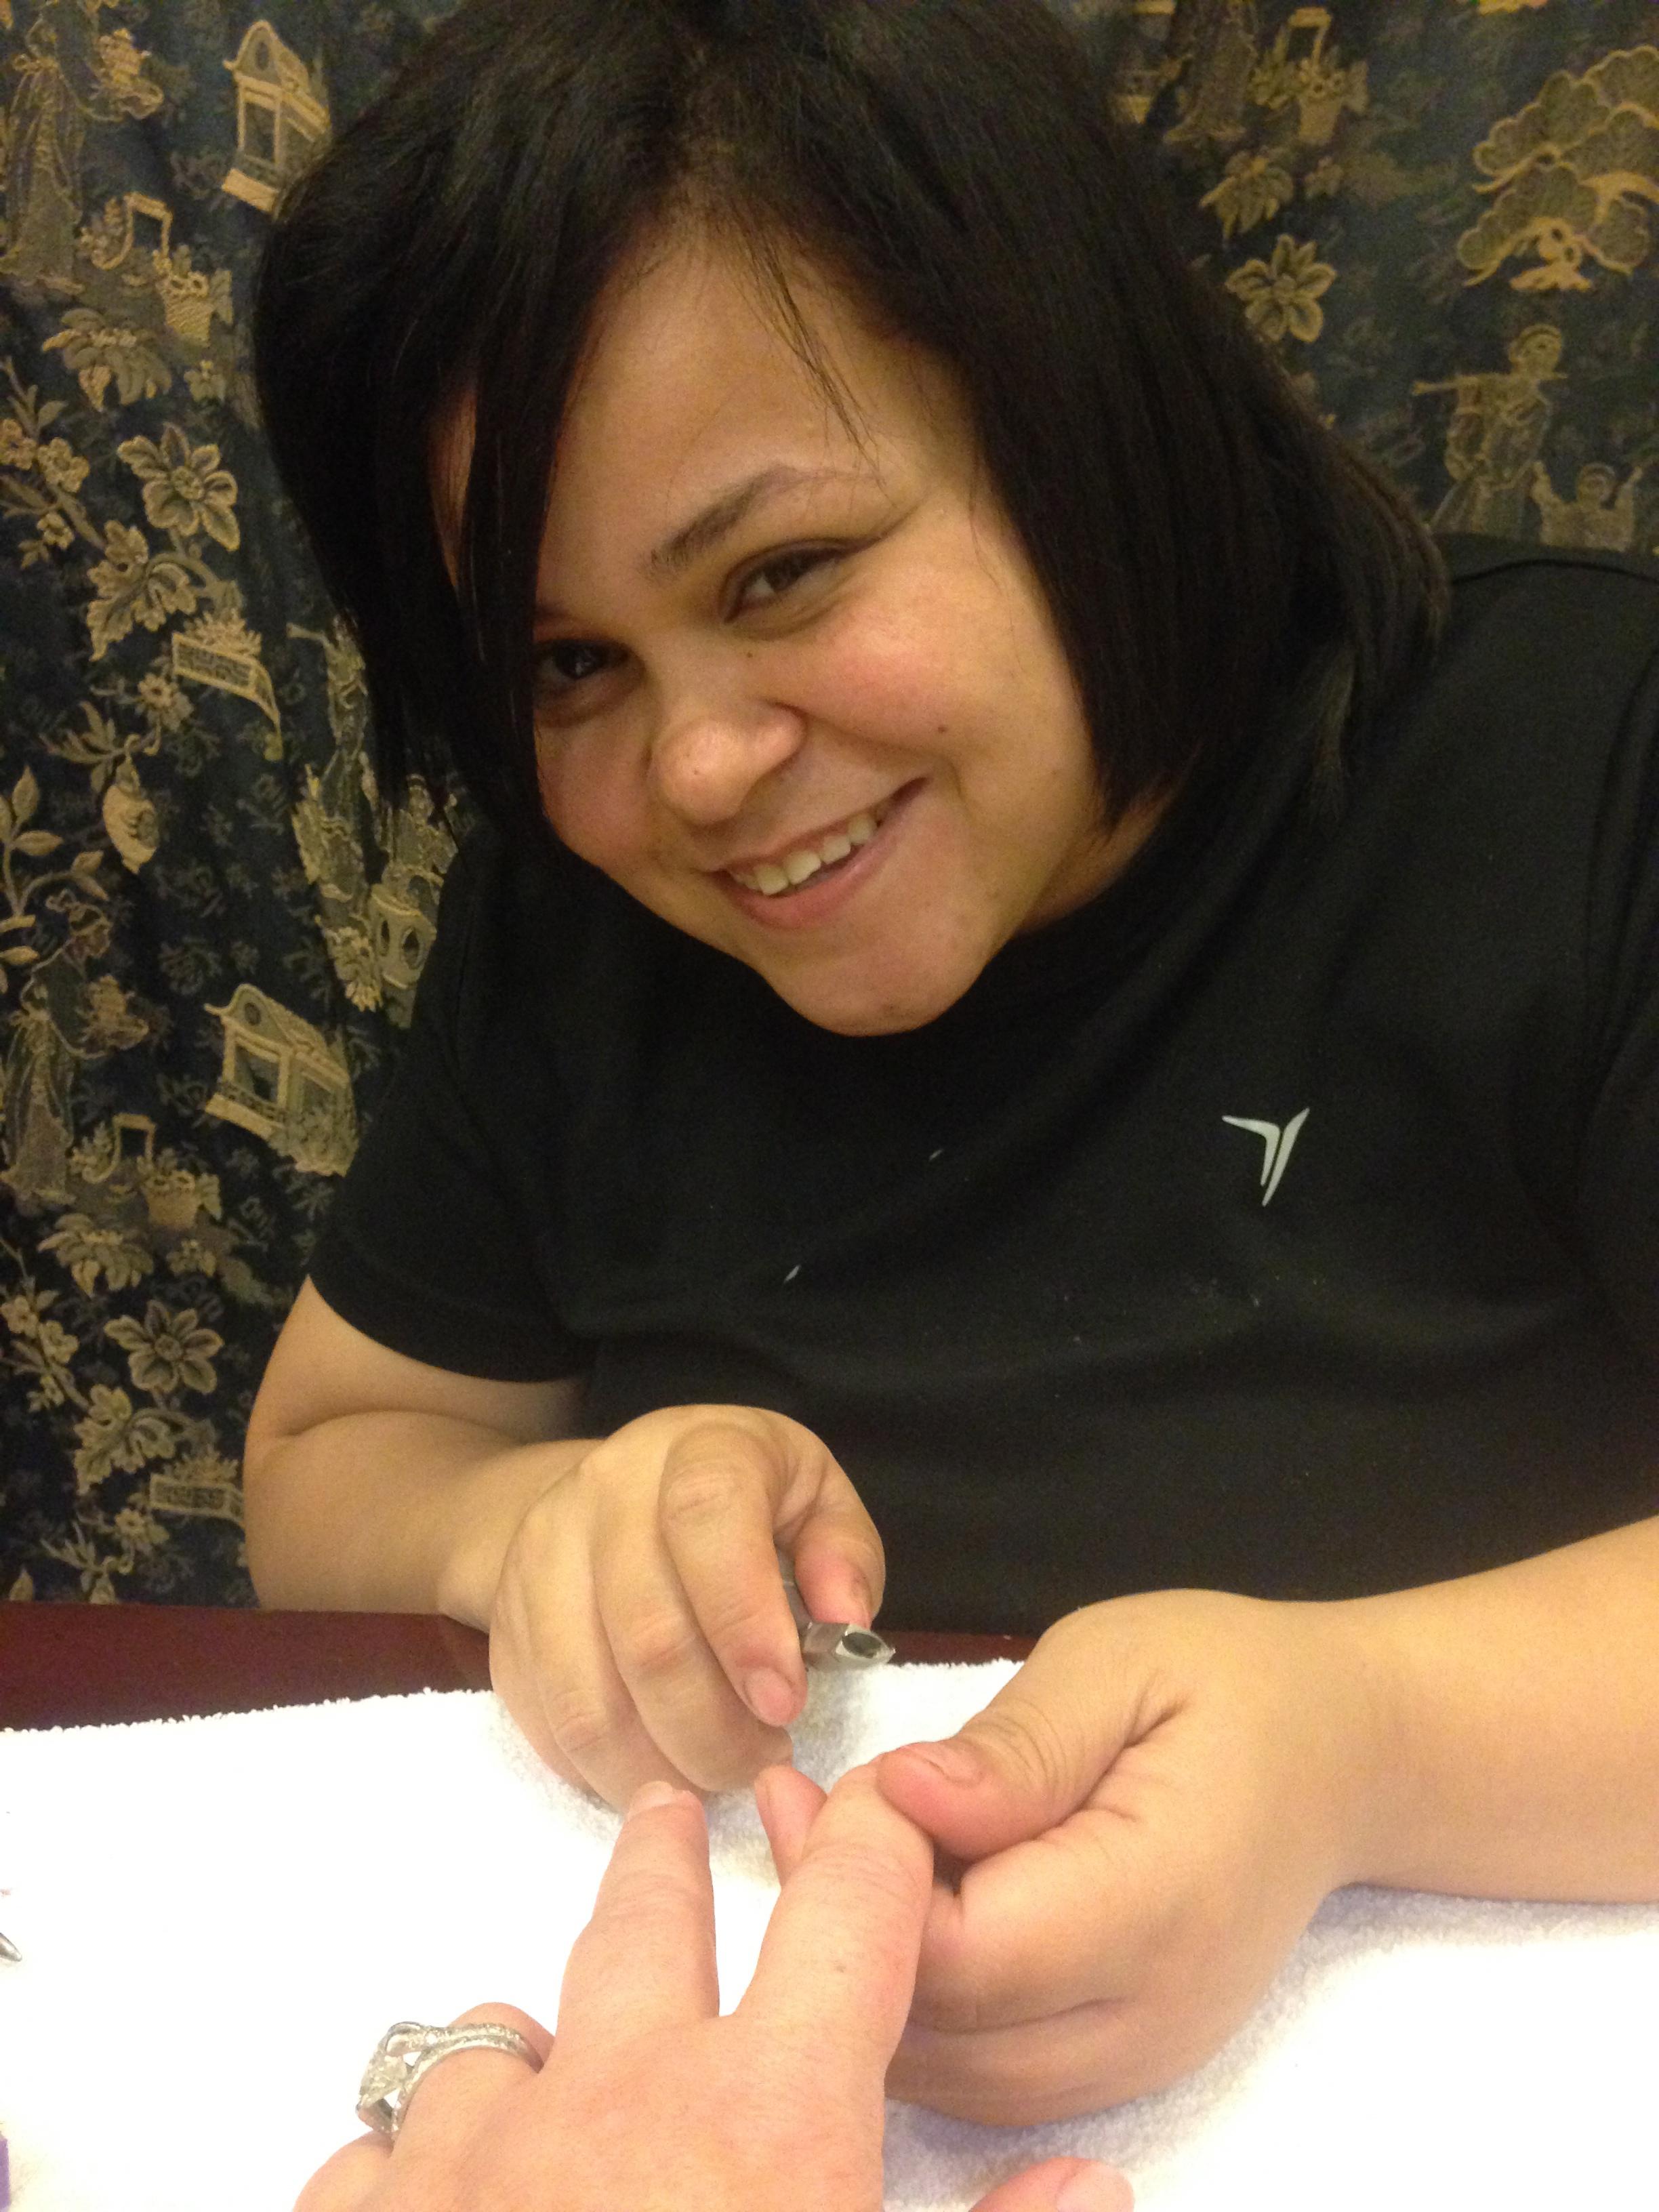 Heidi, my nail technician